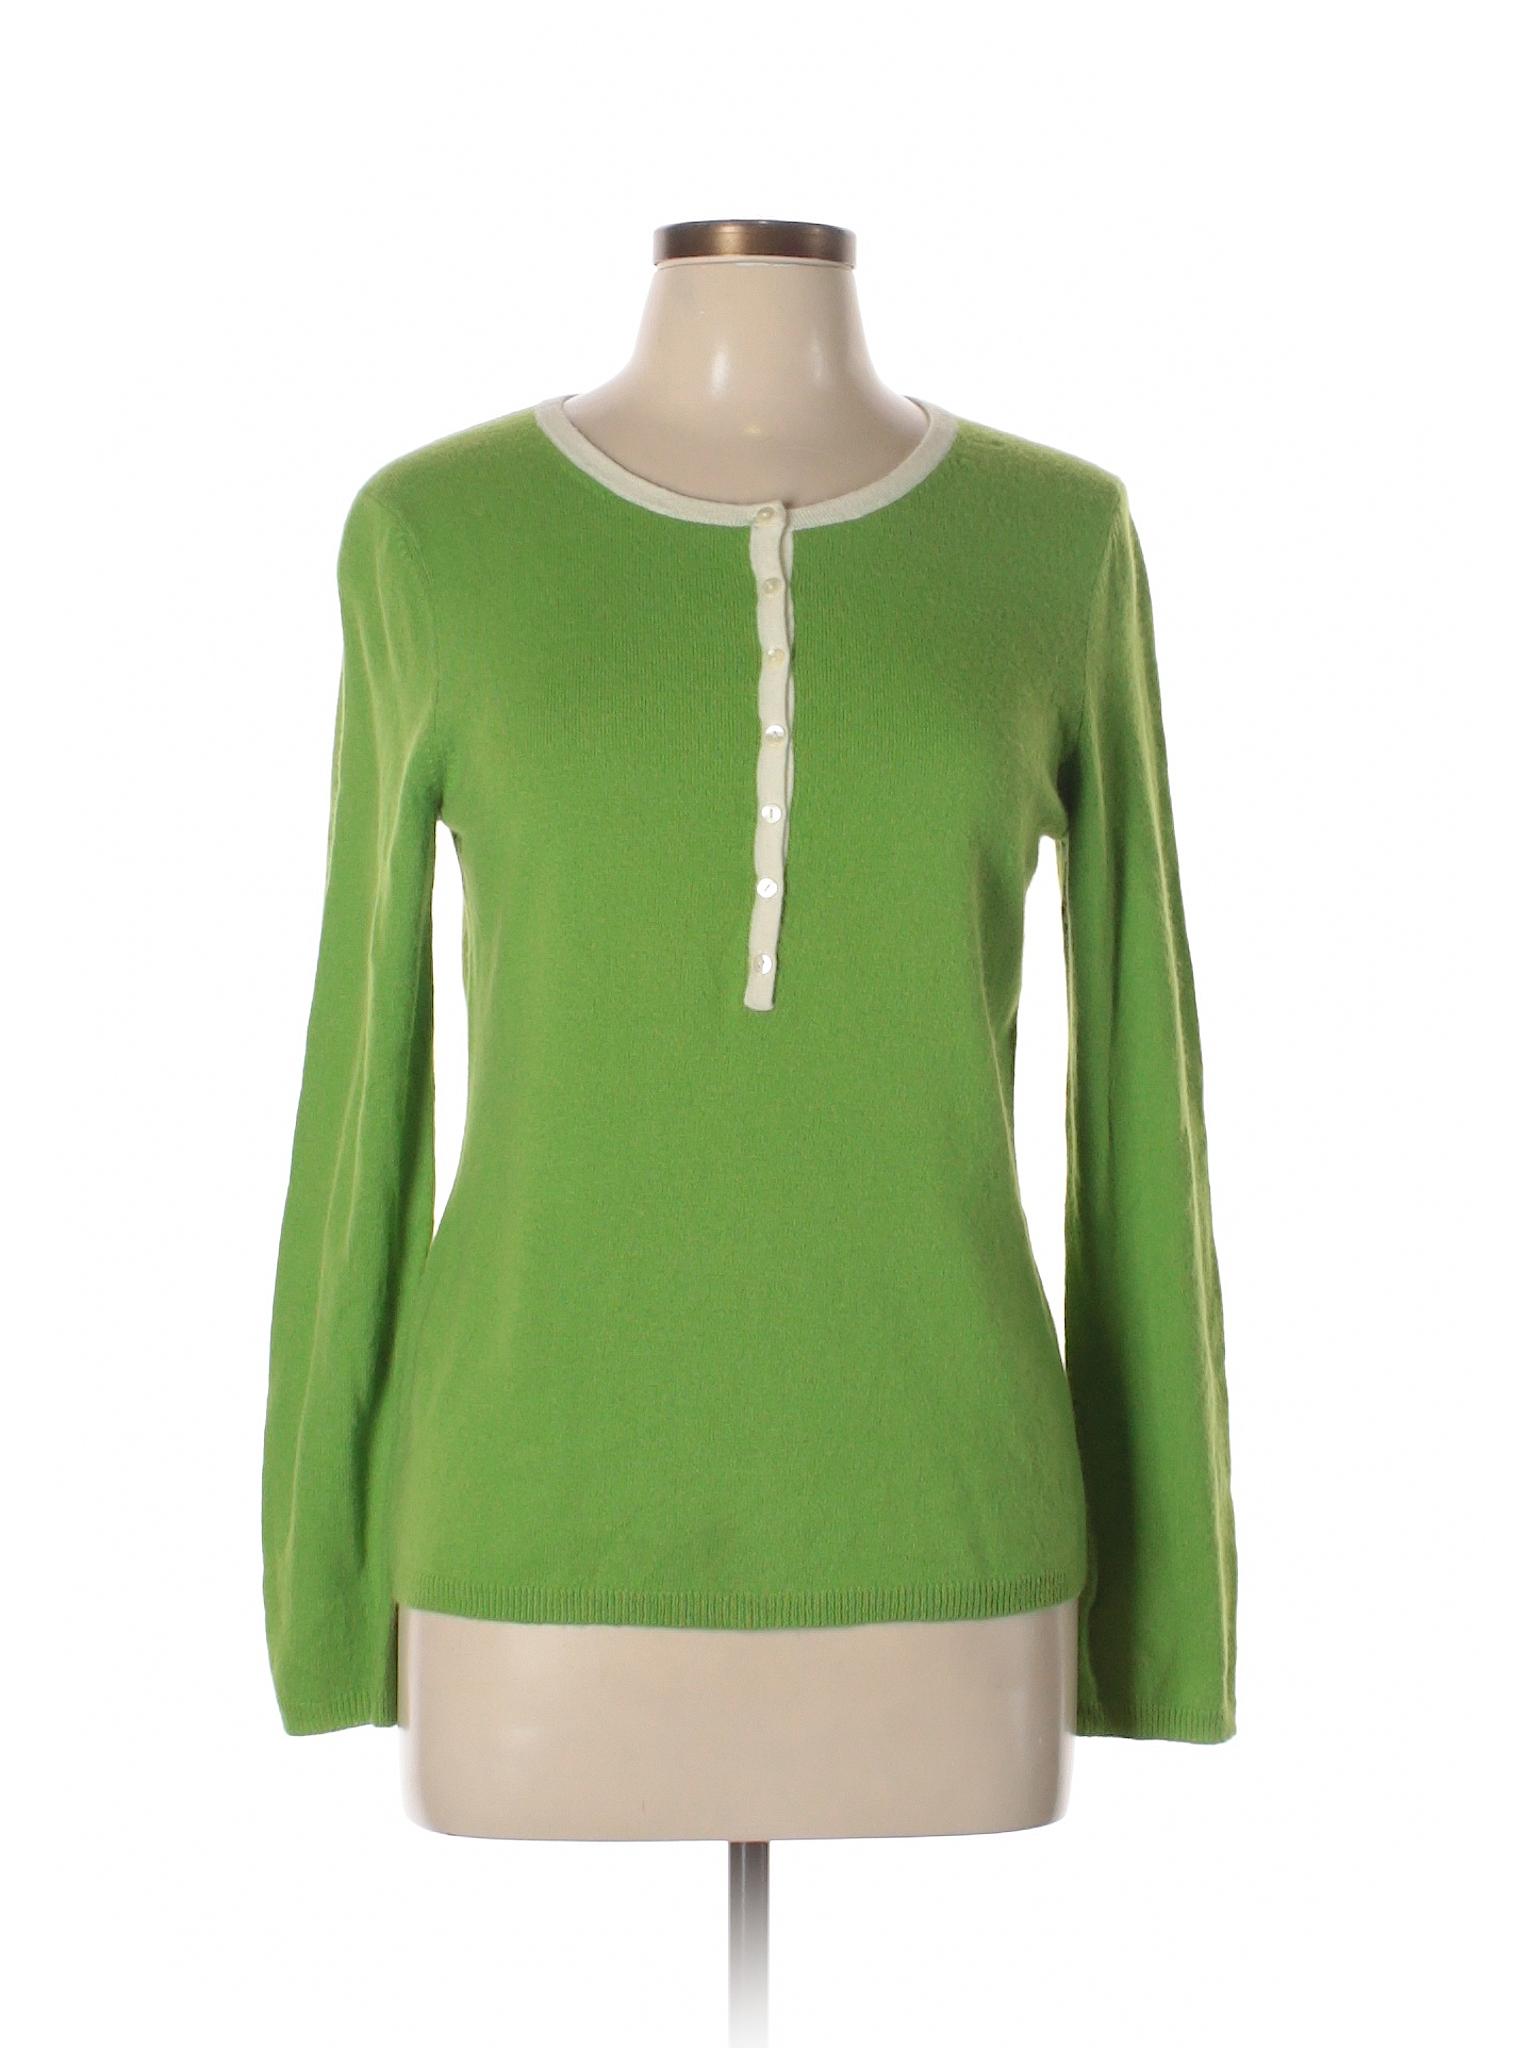 Boutique Boutique Talbots winter winter Talbots Pullover Sweater qq4EPr6wx